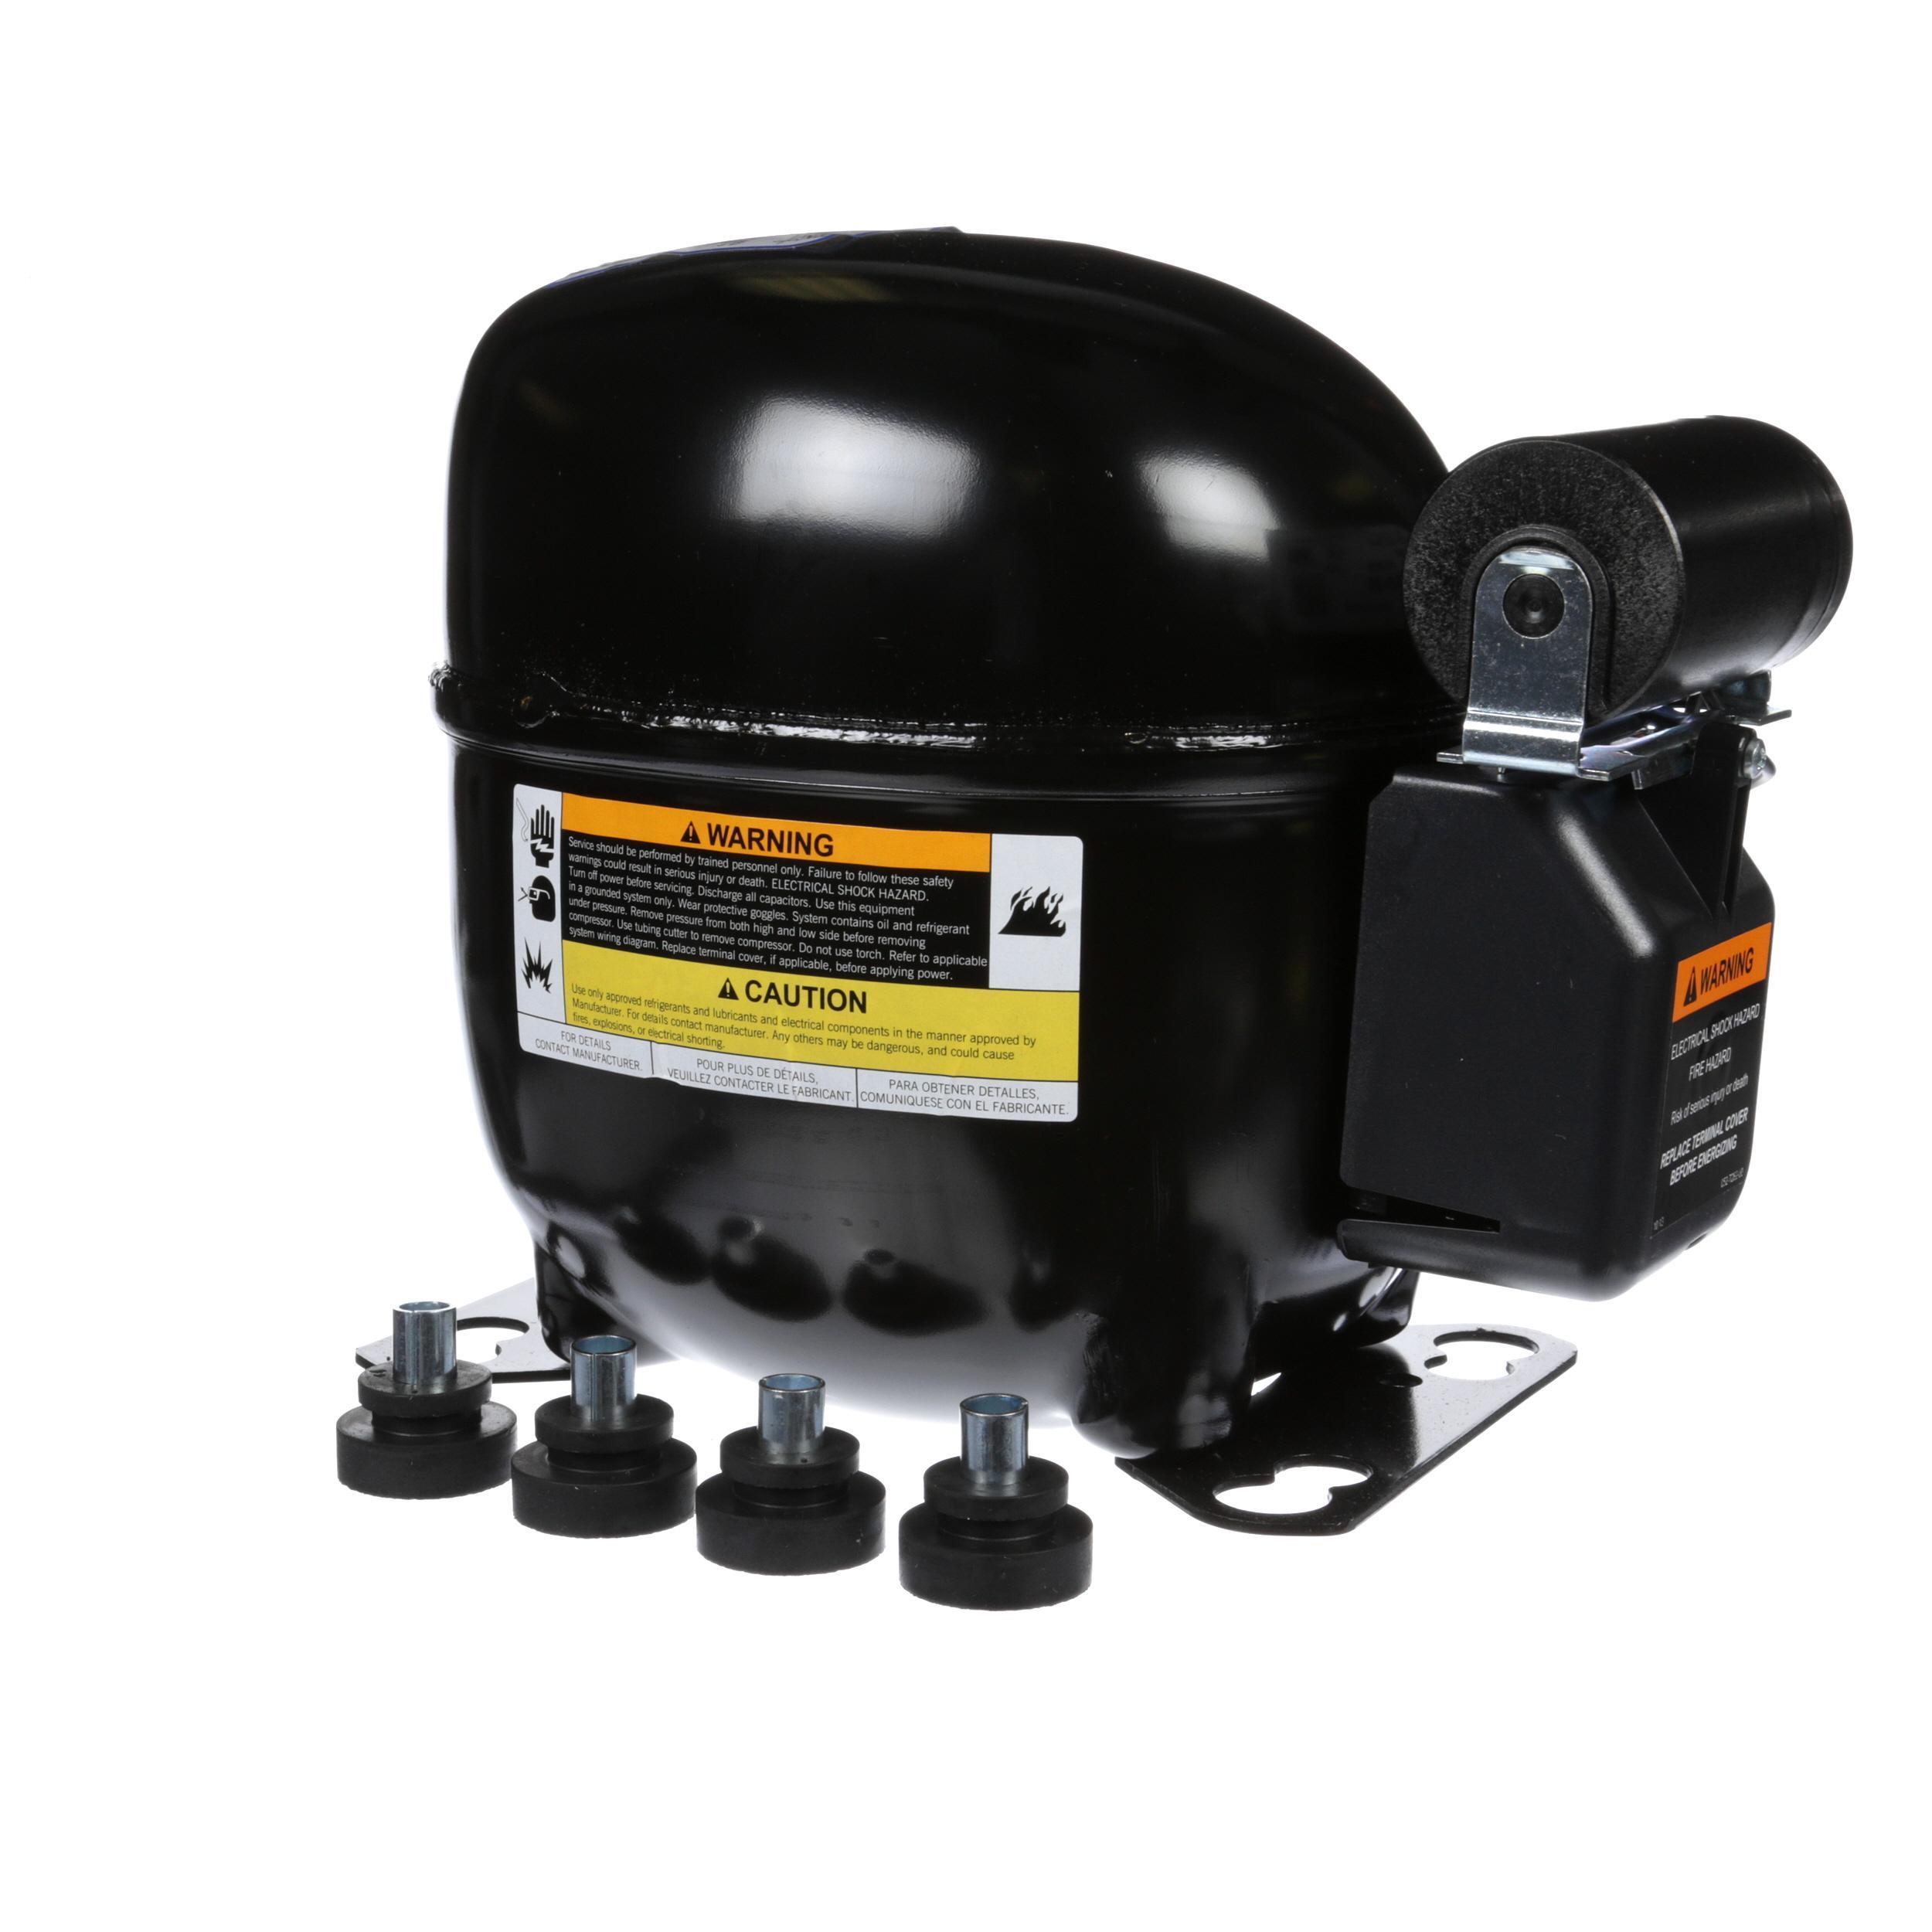 Copeland Compressor Part Afe17c4e Iaa 901 Universal Multiflex Frigidaire Electric Dryer Wiring Diagram Parts